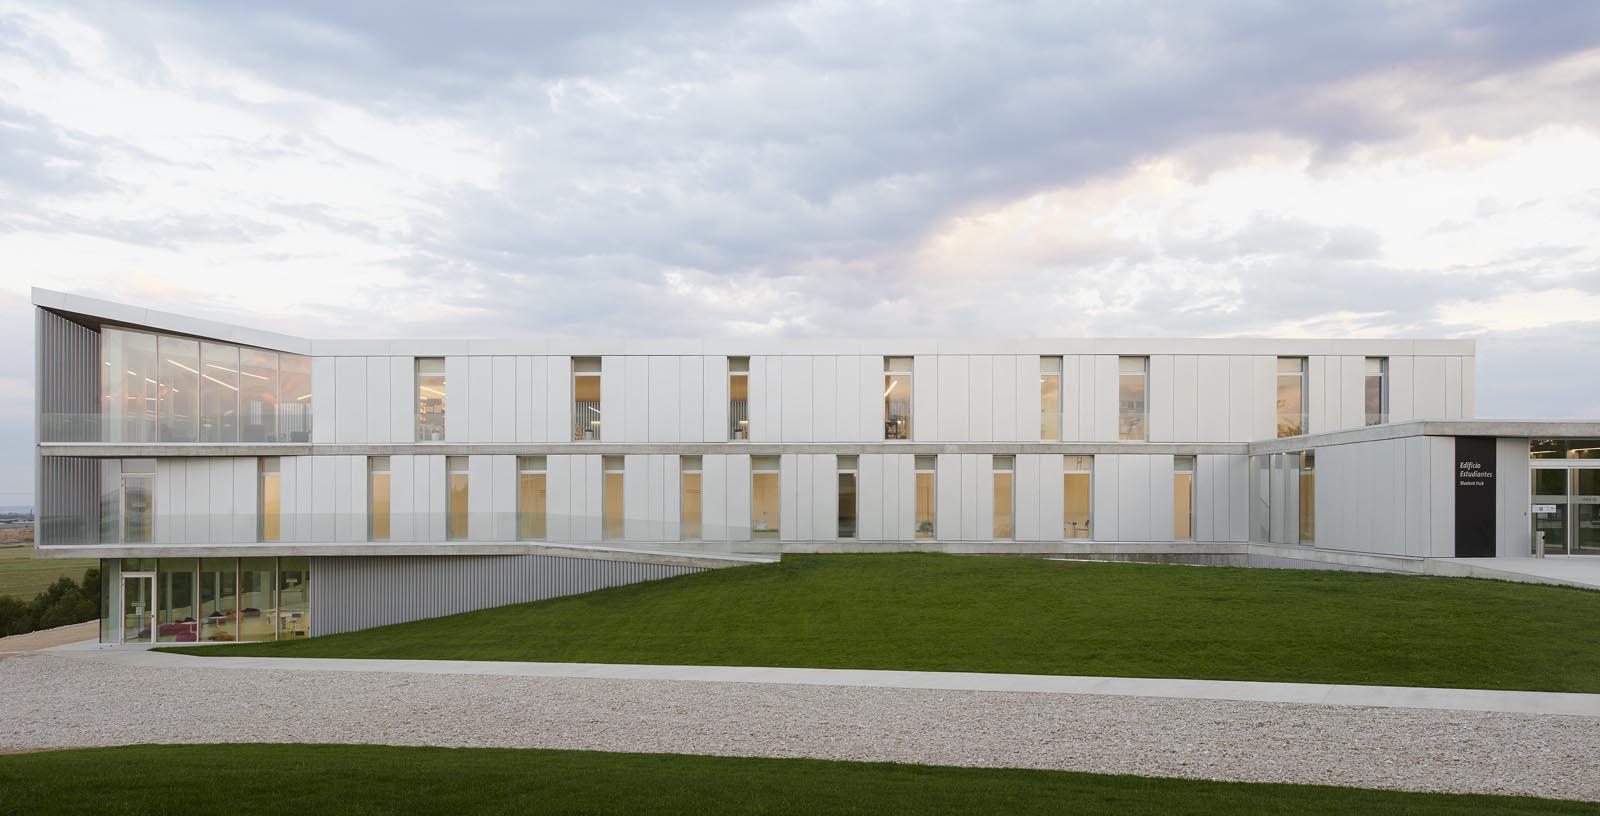 Building-San_Jorge_University_05-Architecture-IDOM-copyright-Inaki_Bergera